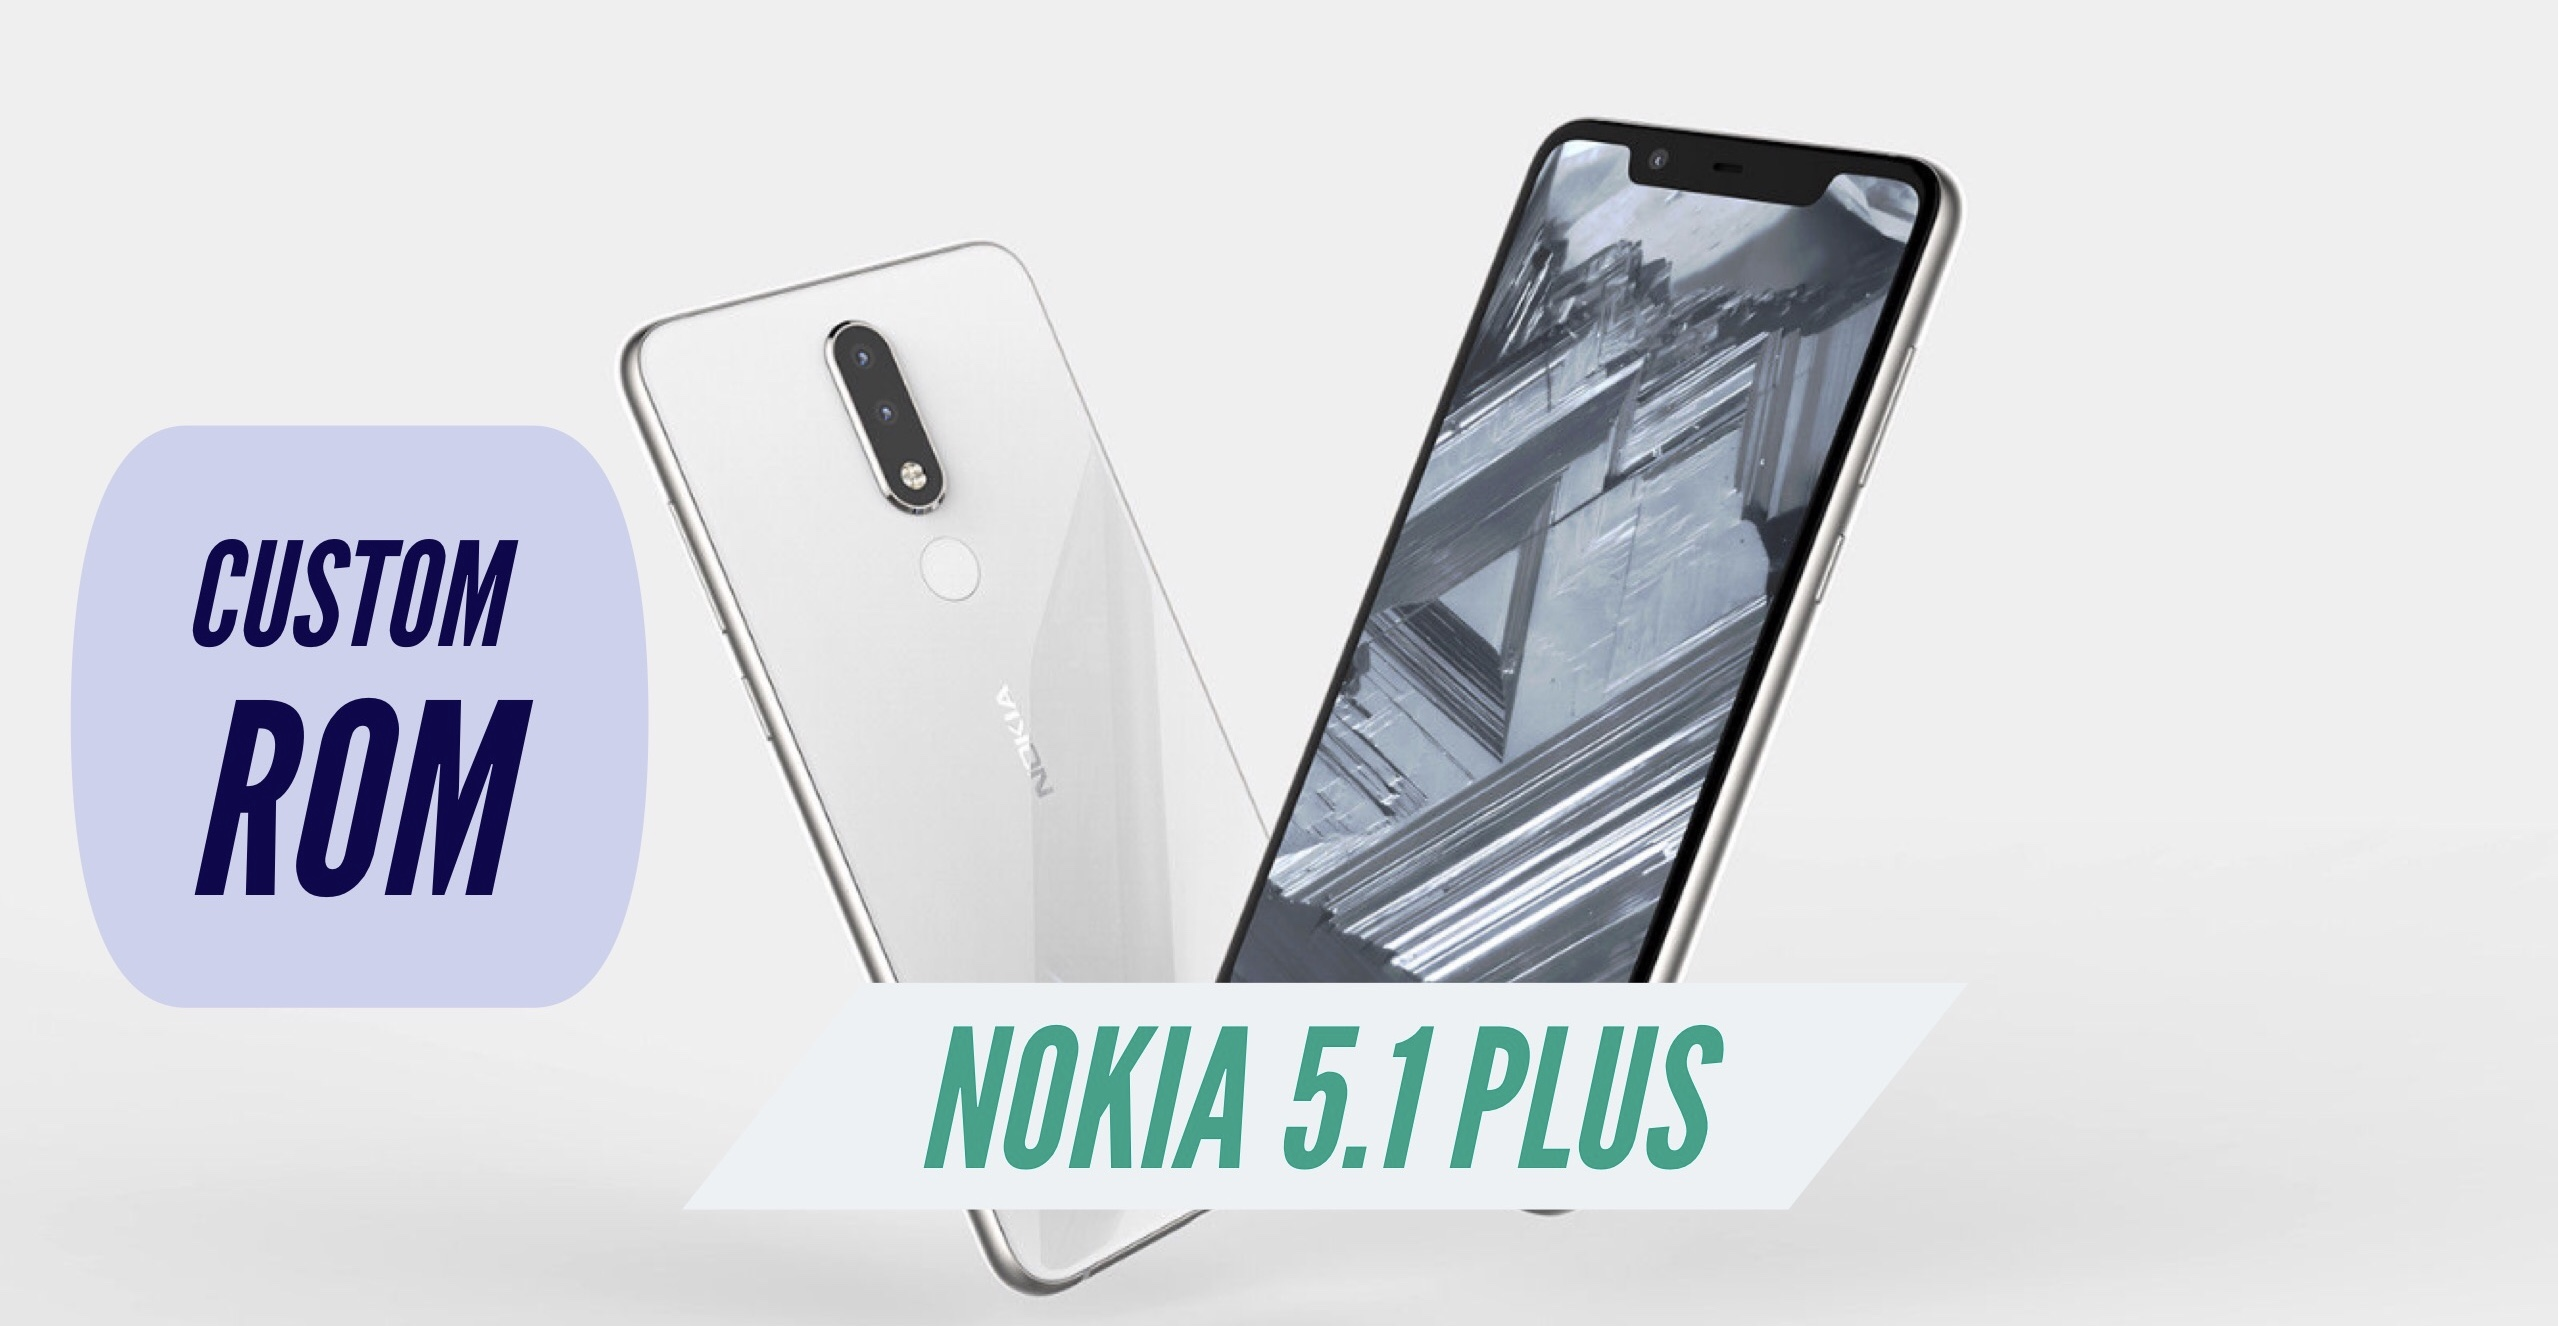 How to Install Custom ROM on Nokia 5 1 Plus (X5): CWM & TWRP!